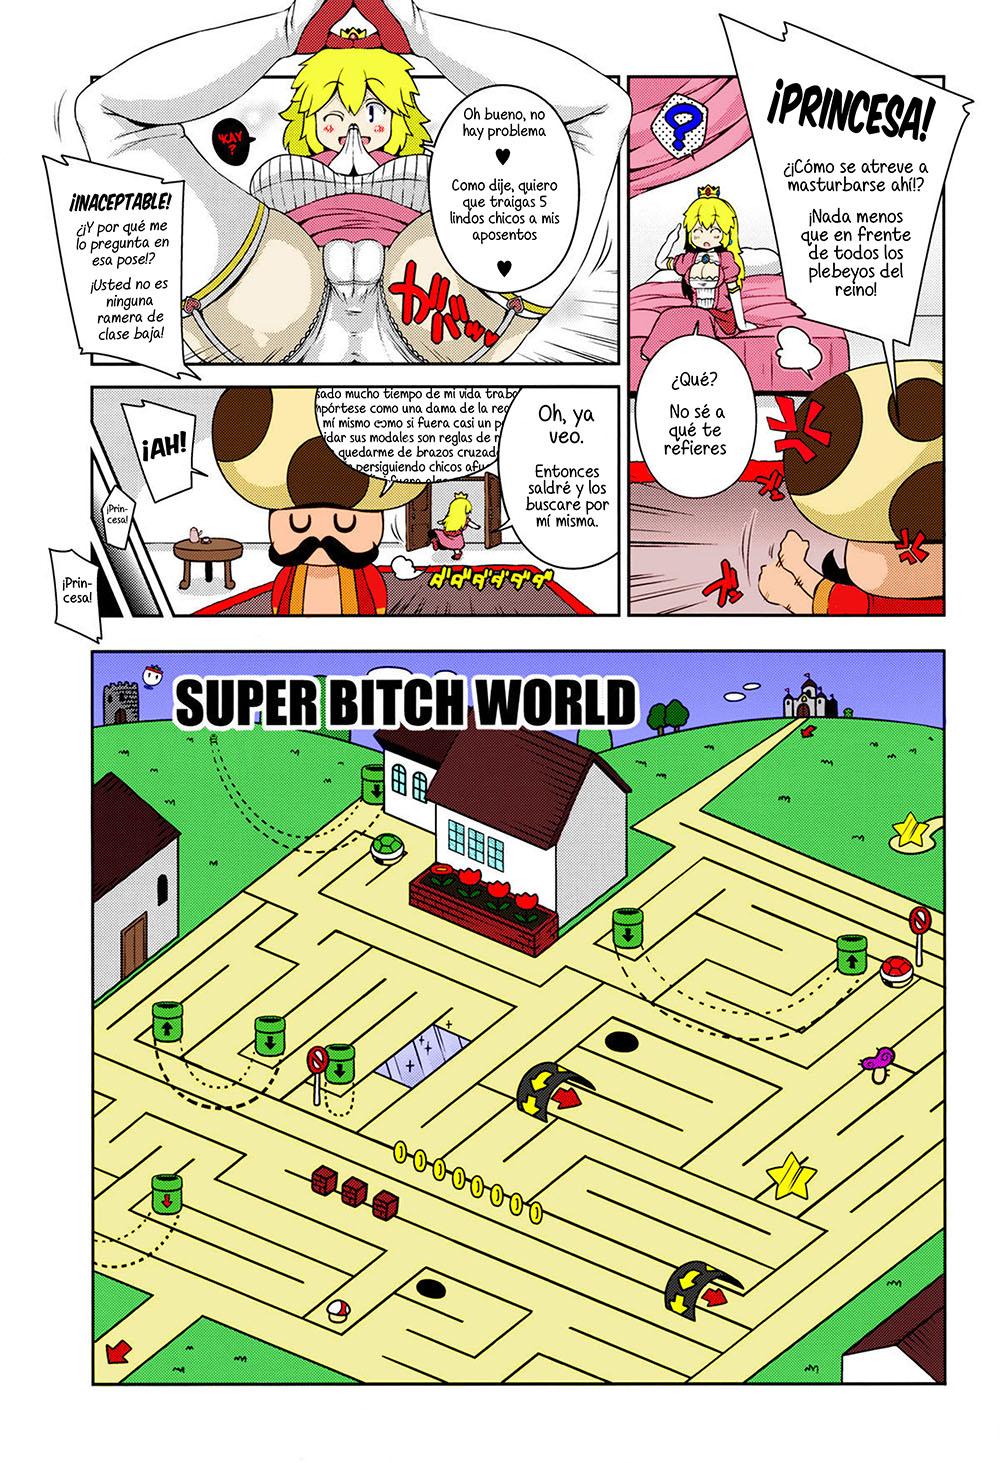 Super BITCH World